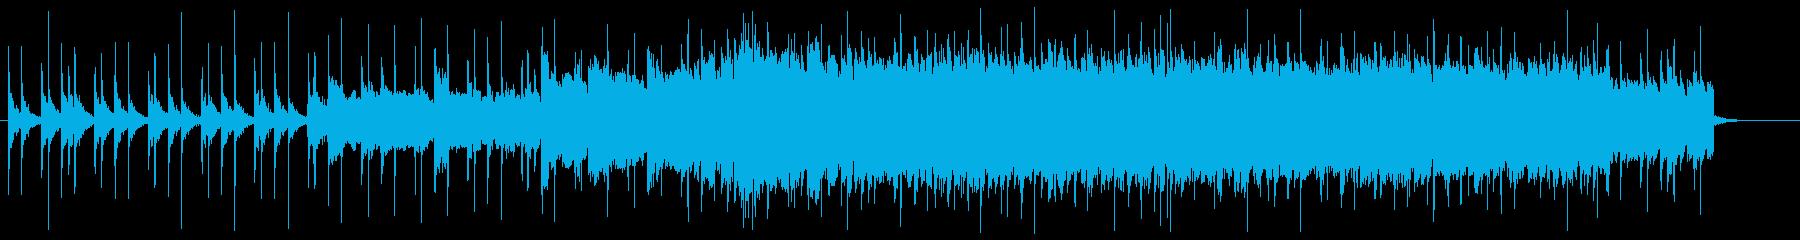 CM向けロックアンセム 声タンバリン無の再生済みの波形